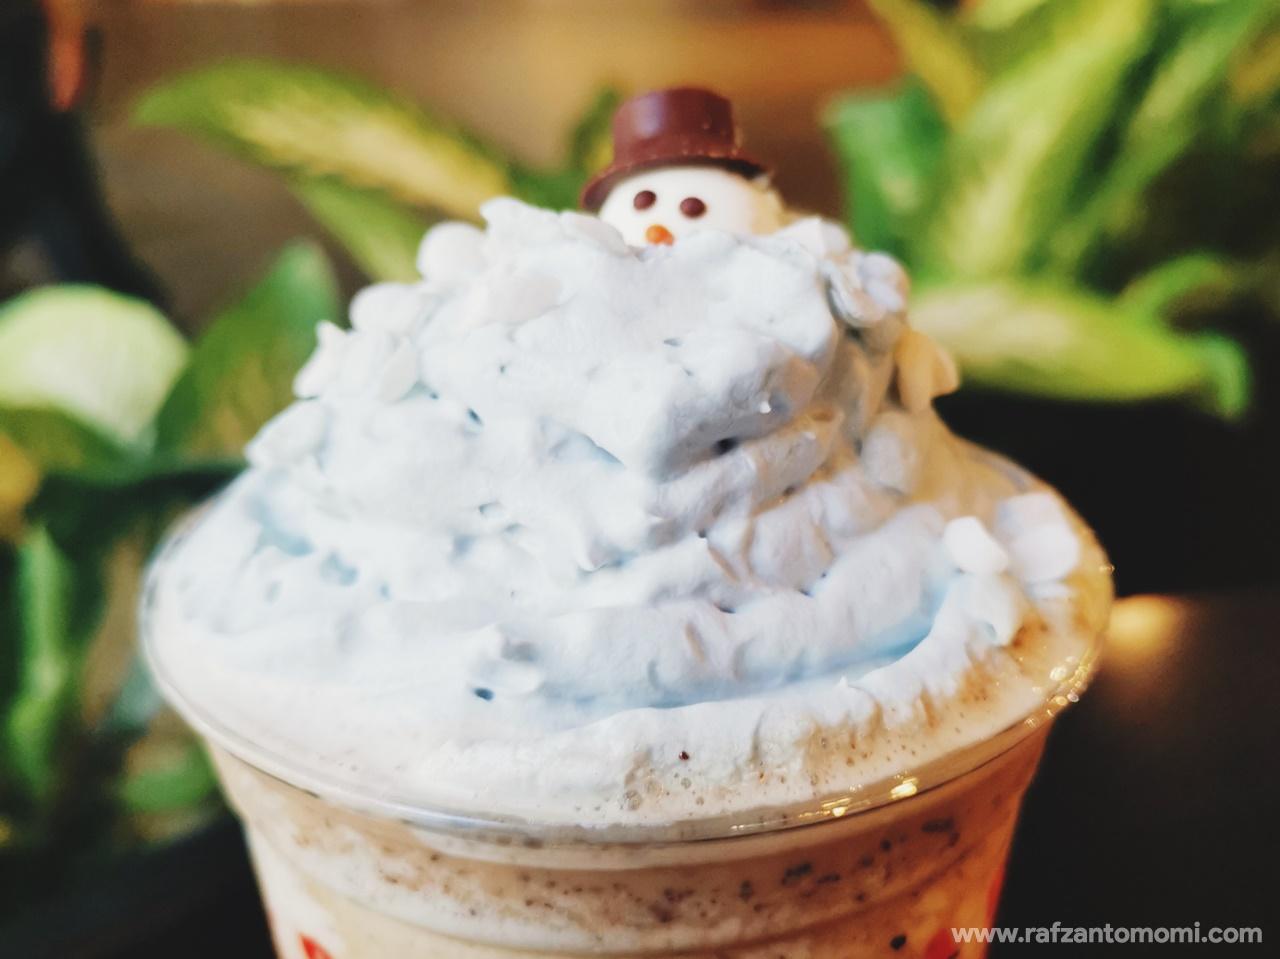 Holiday French Vanilla Latte Dari Starbucks Malaysia - Cuba Try Test Tengok